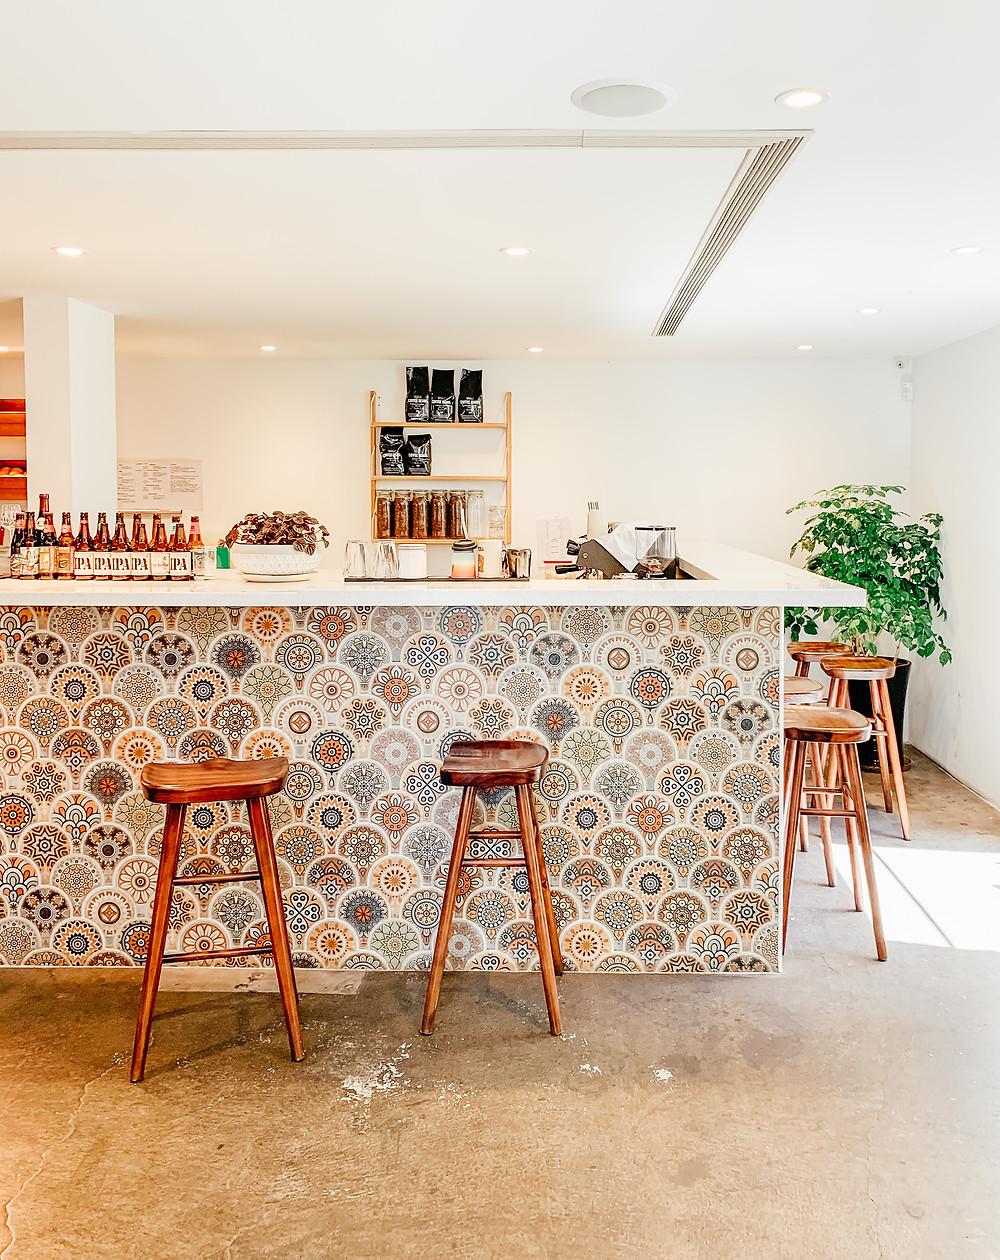 JB's Diner | Taipei Restaurant | A Style Alike